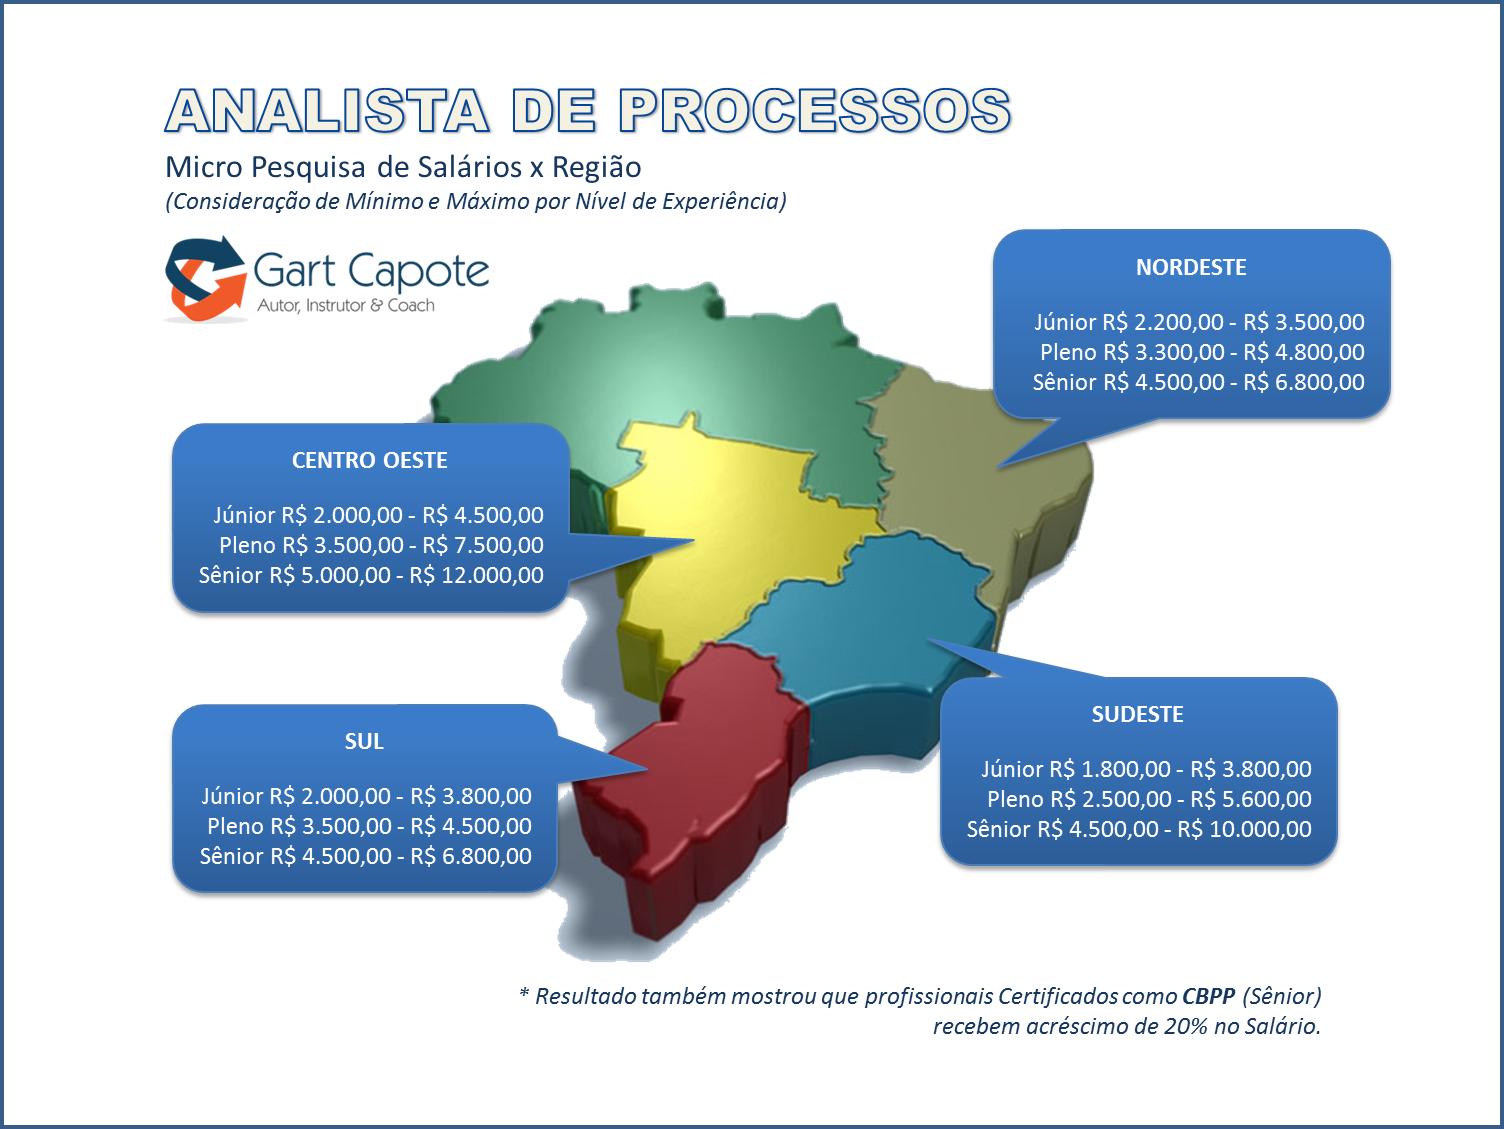 Gart Capote Mundo Bpm Analista De Processos Pesquisa